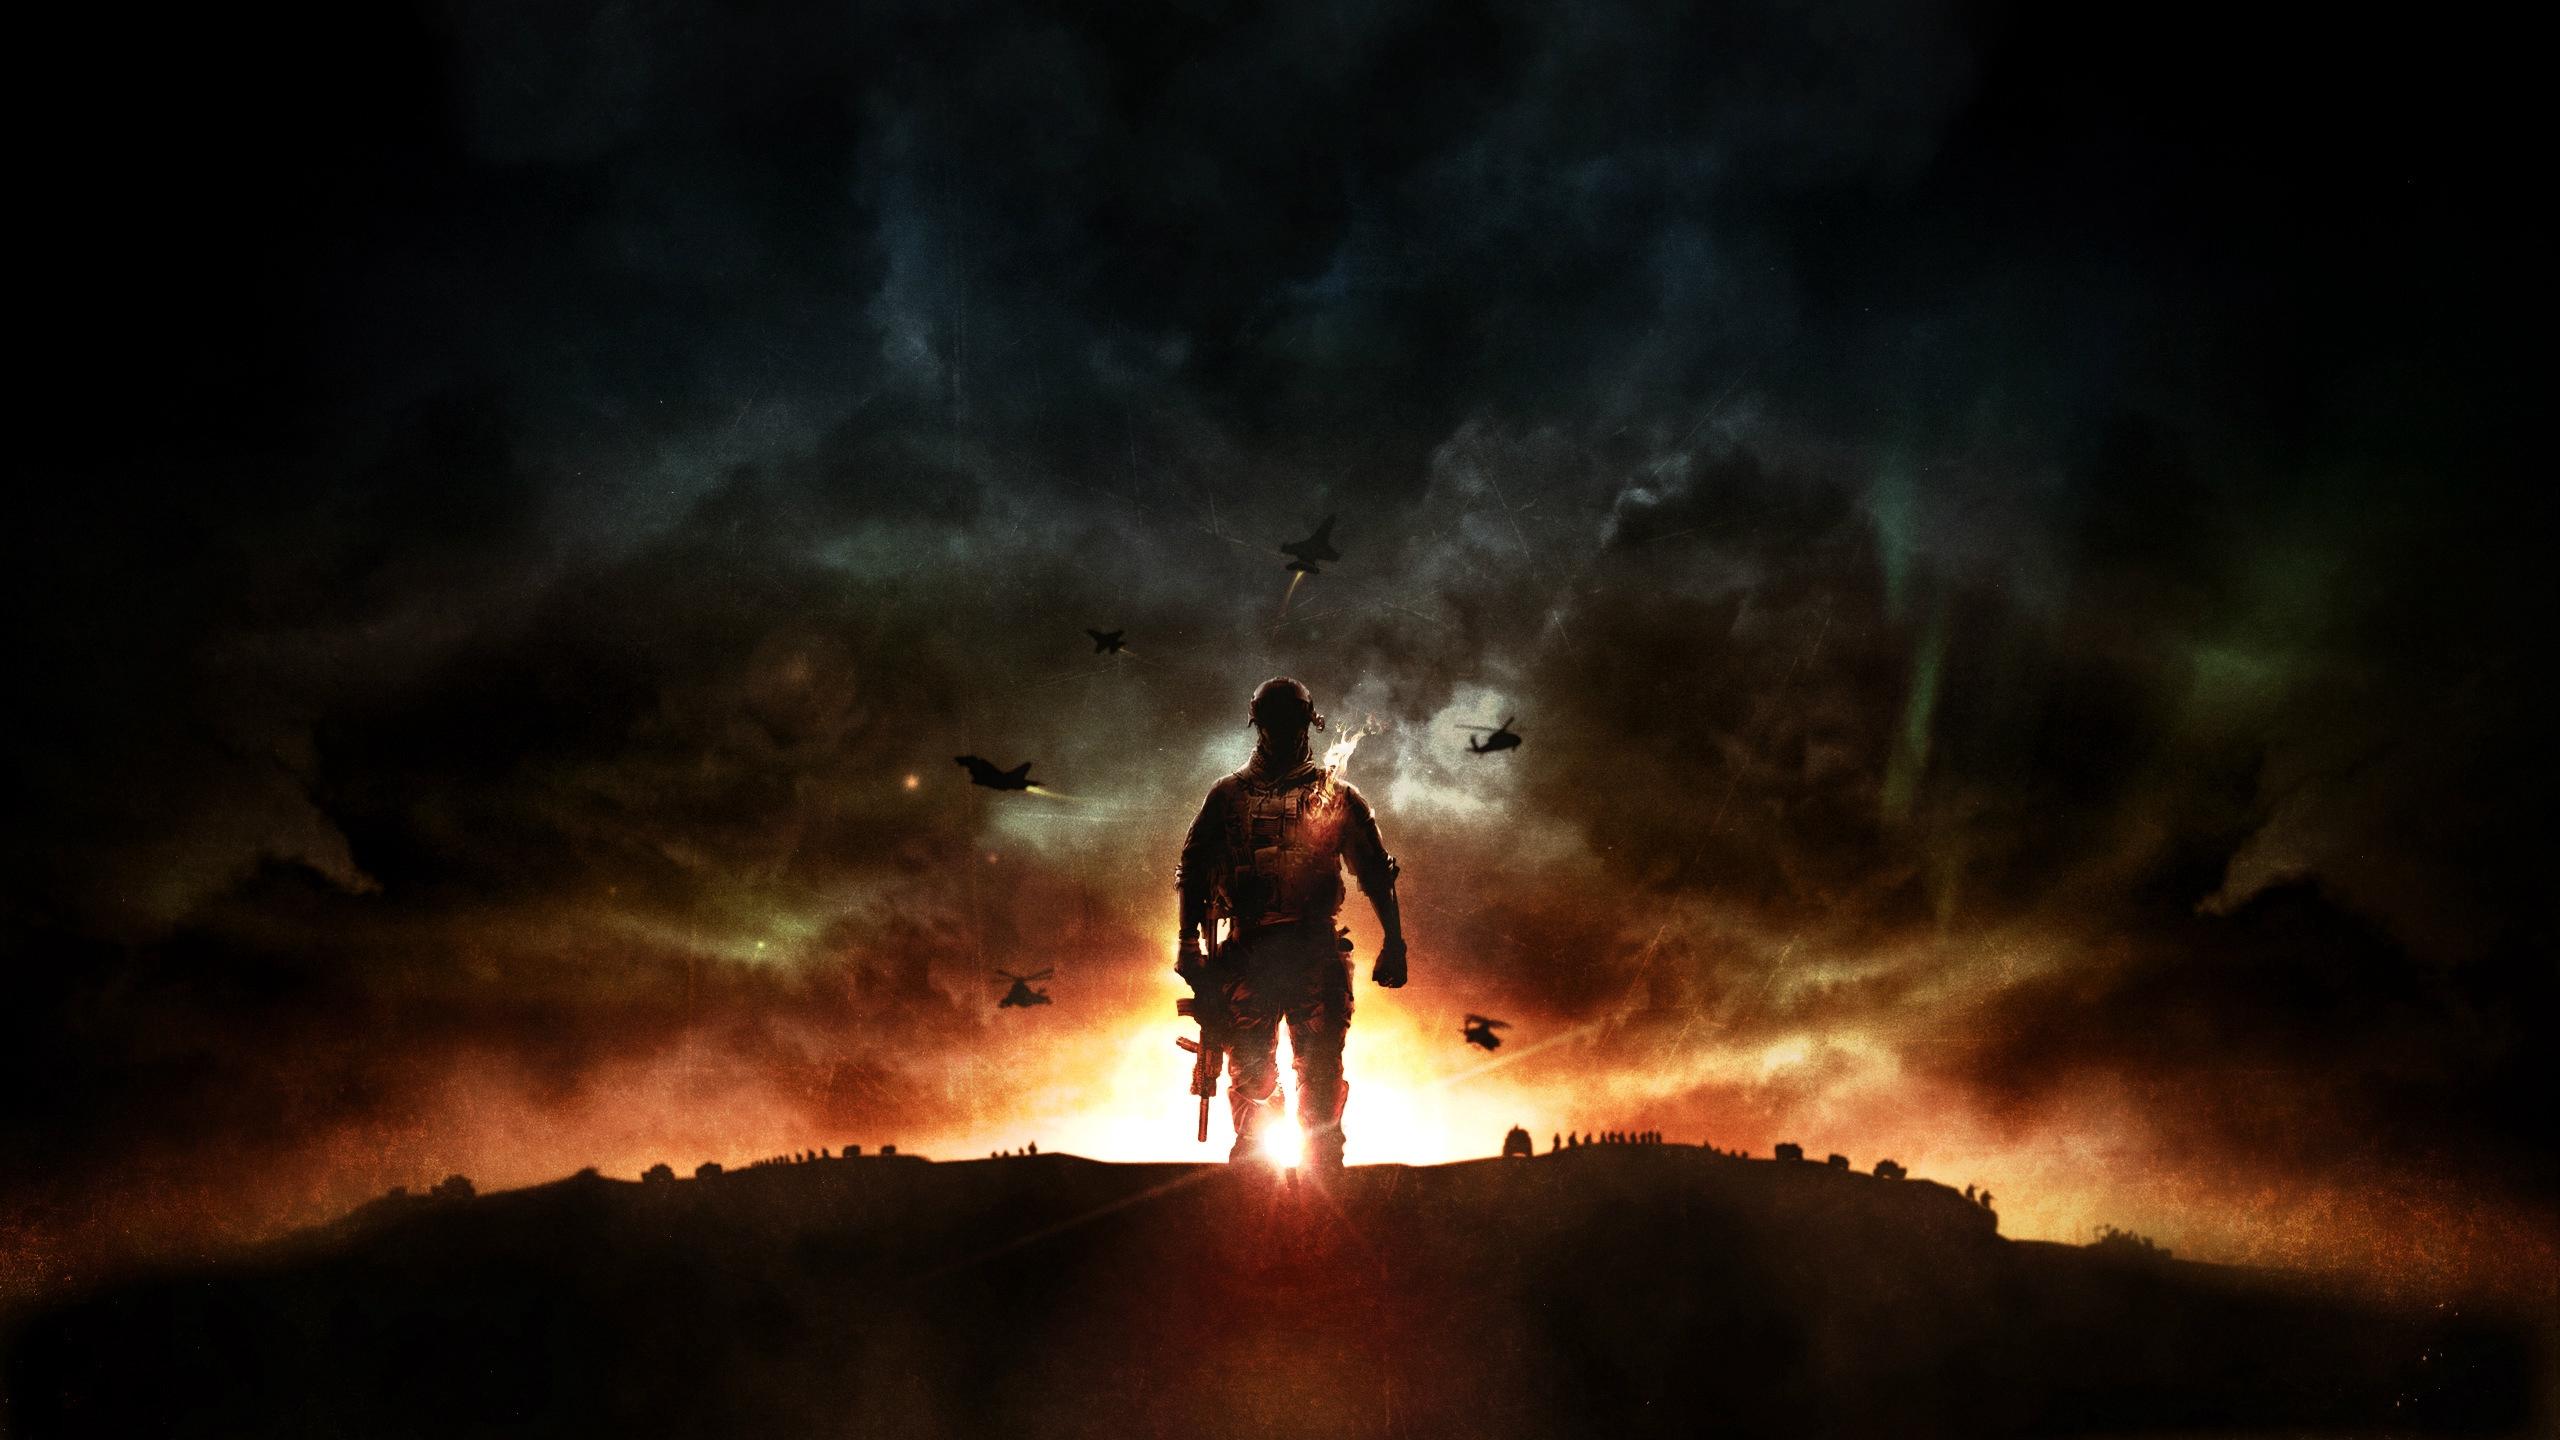 Wallpaper Battlefield 4, Game, Explosion, Ea Digital - Battlefield Wallpapers 1080p - HD Wallpaper